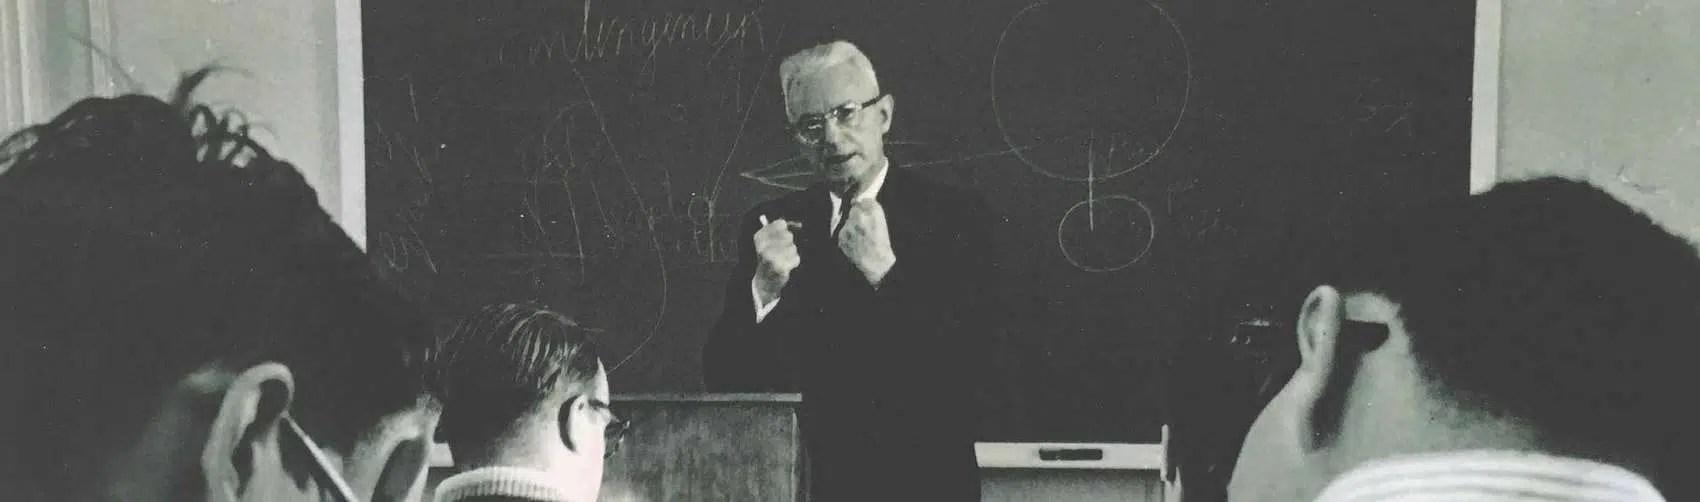 Cornelius Van Til teaching